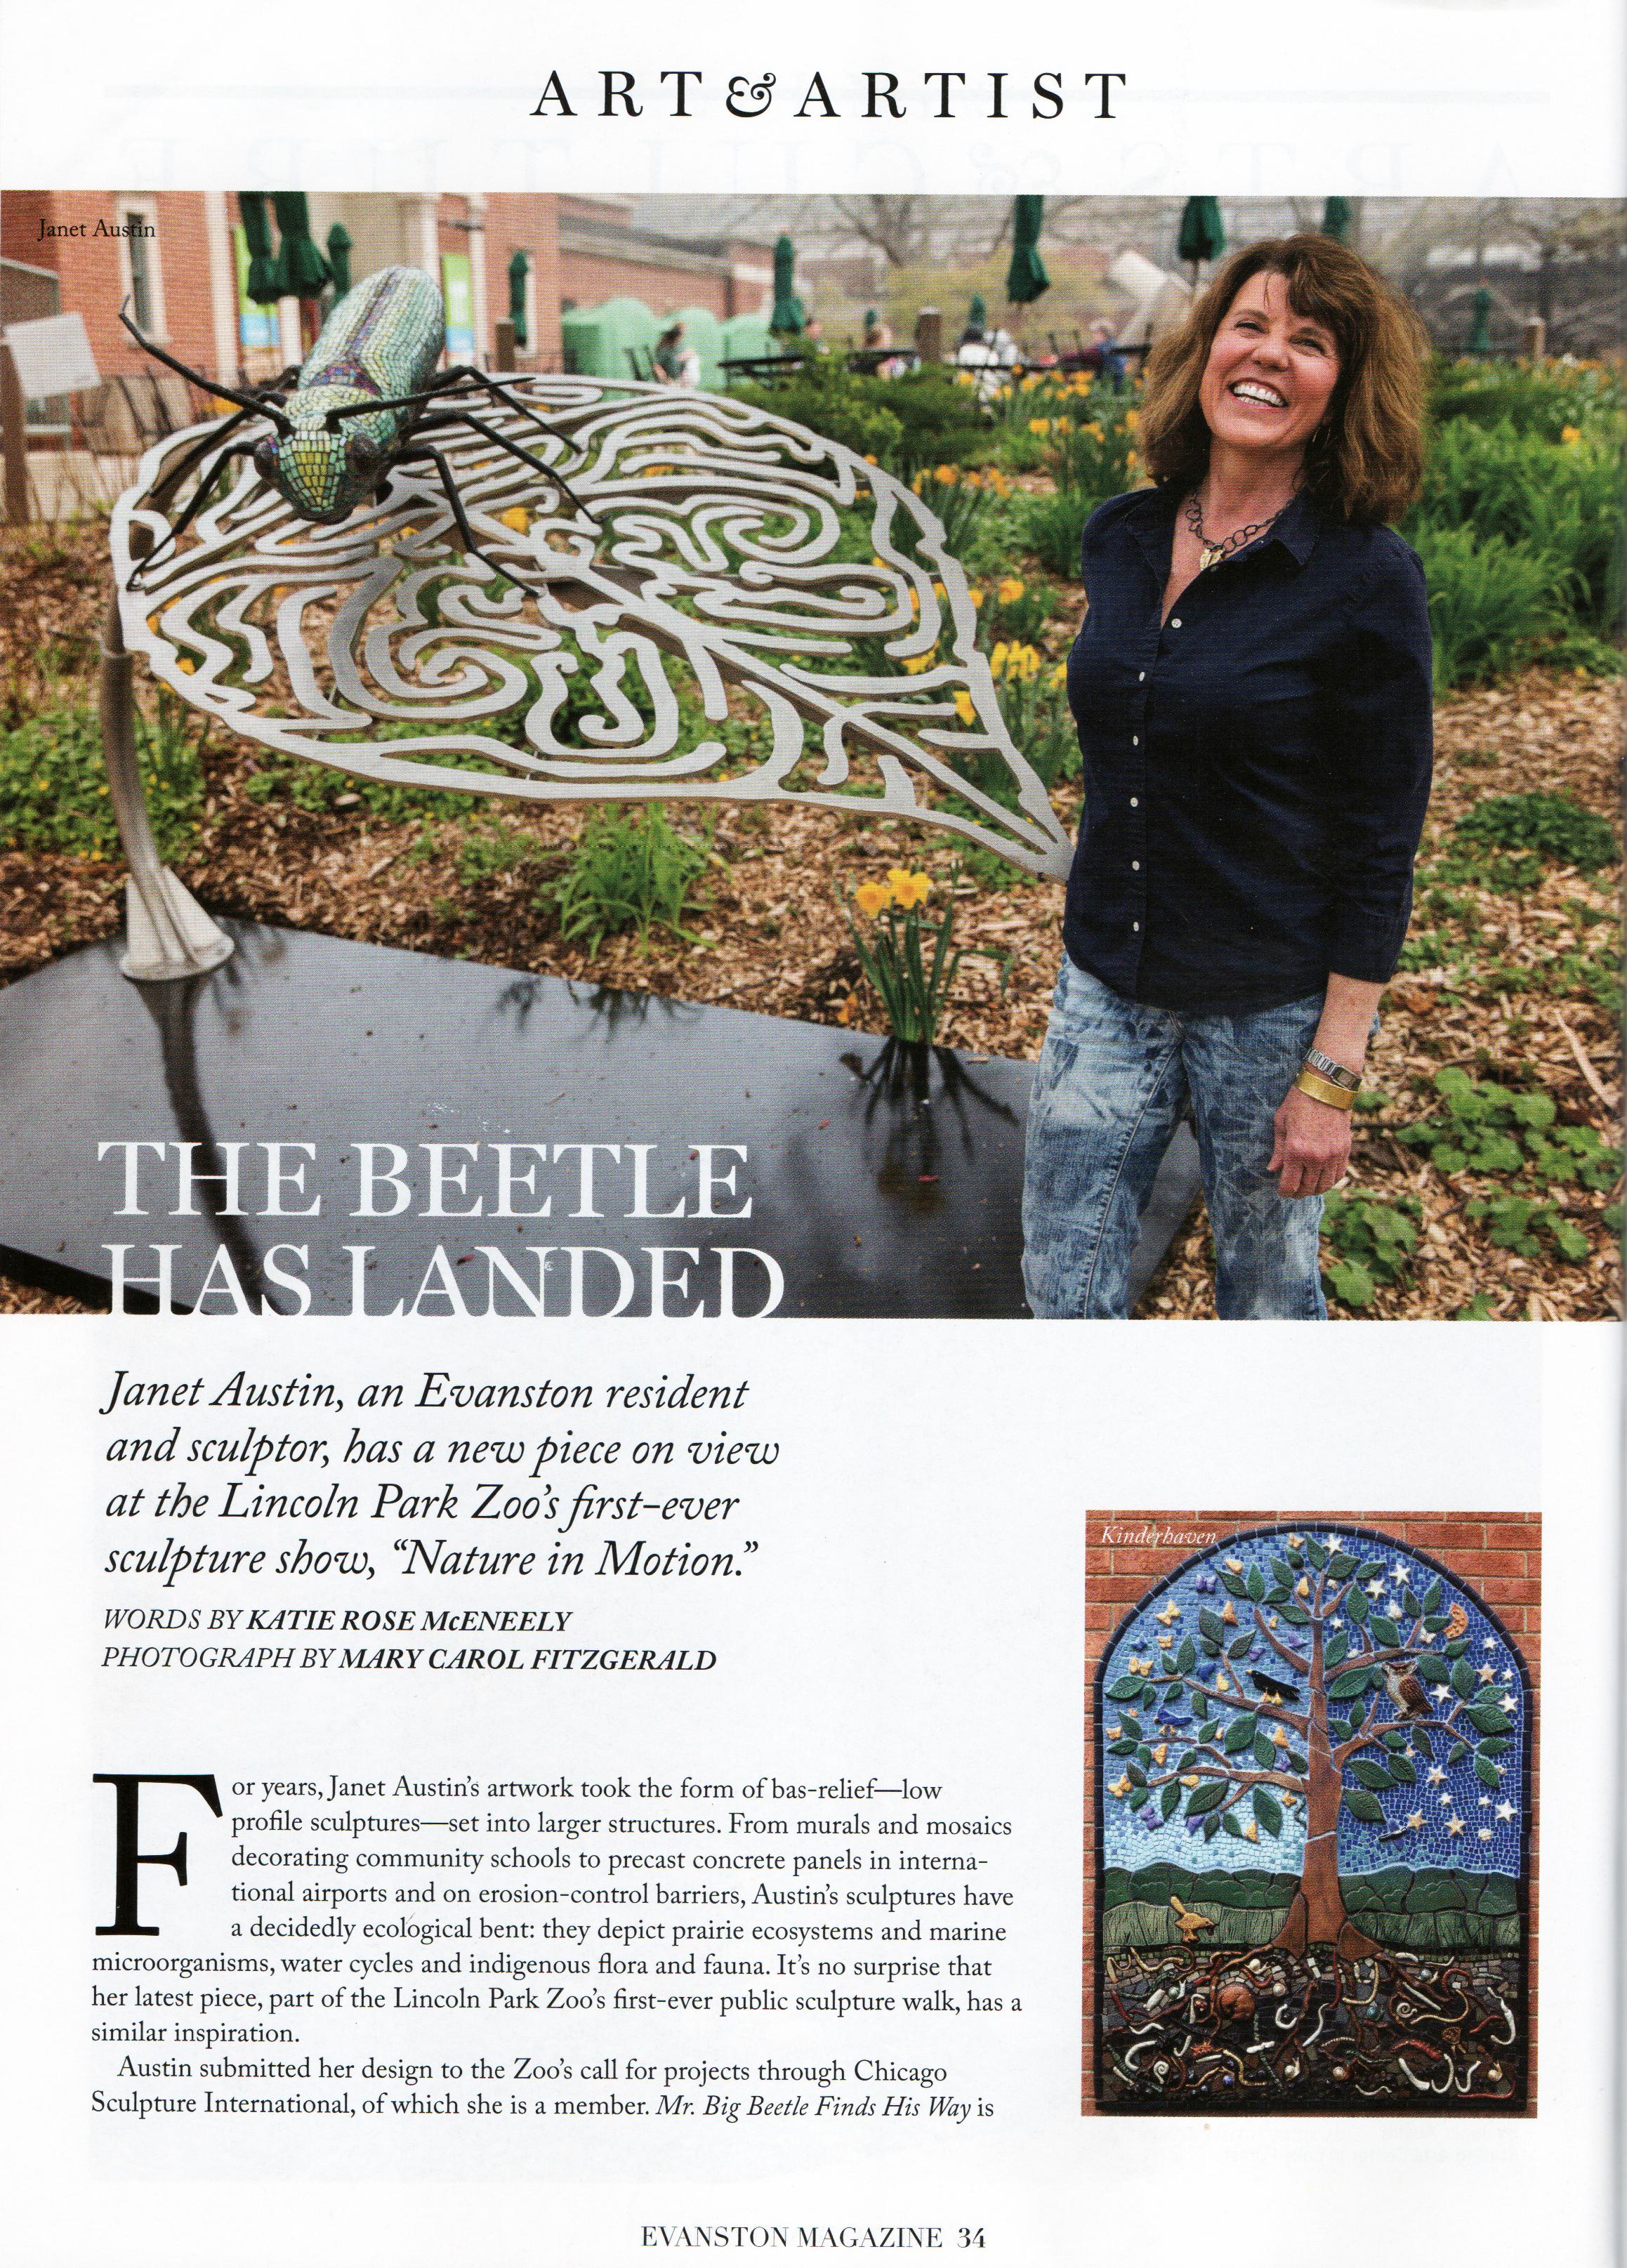 Evanston Magazine pg 1